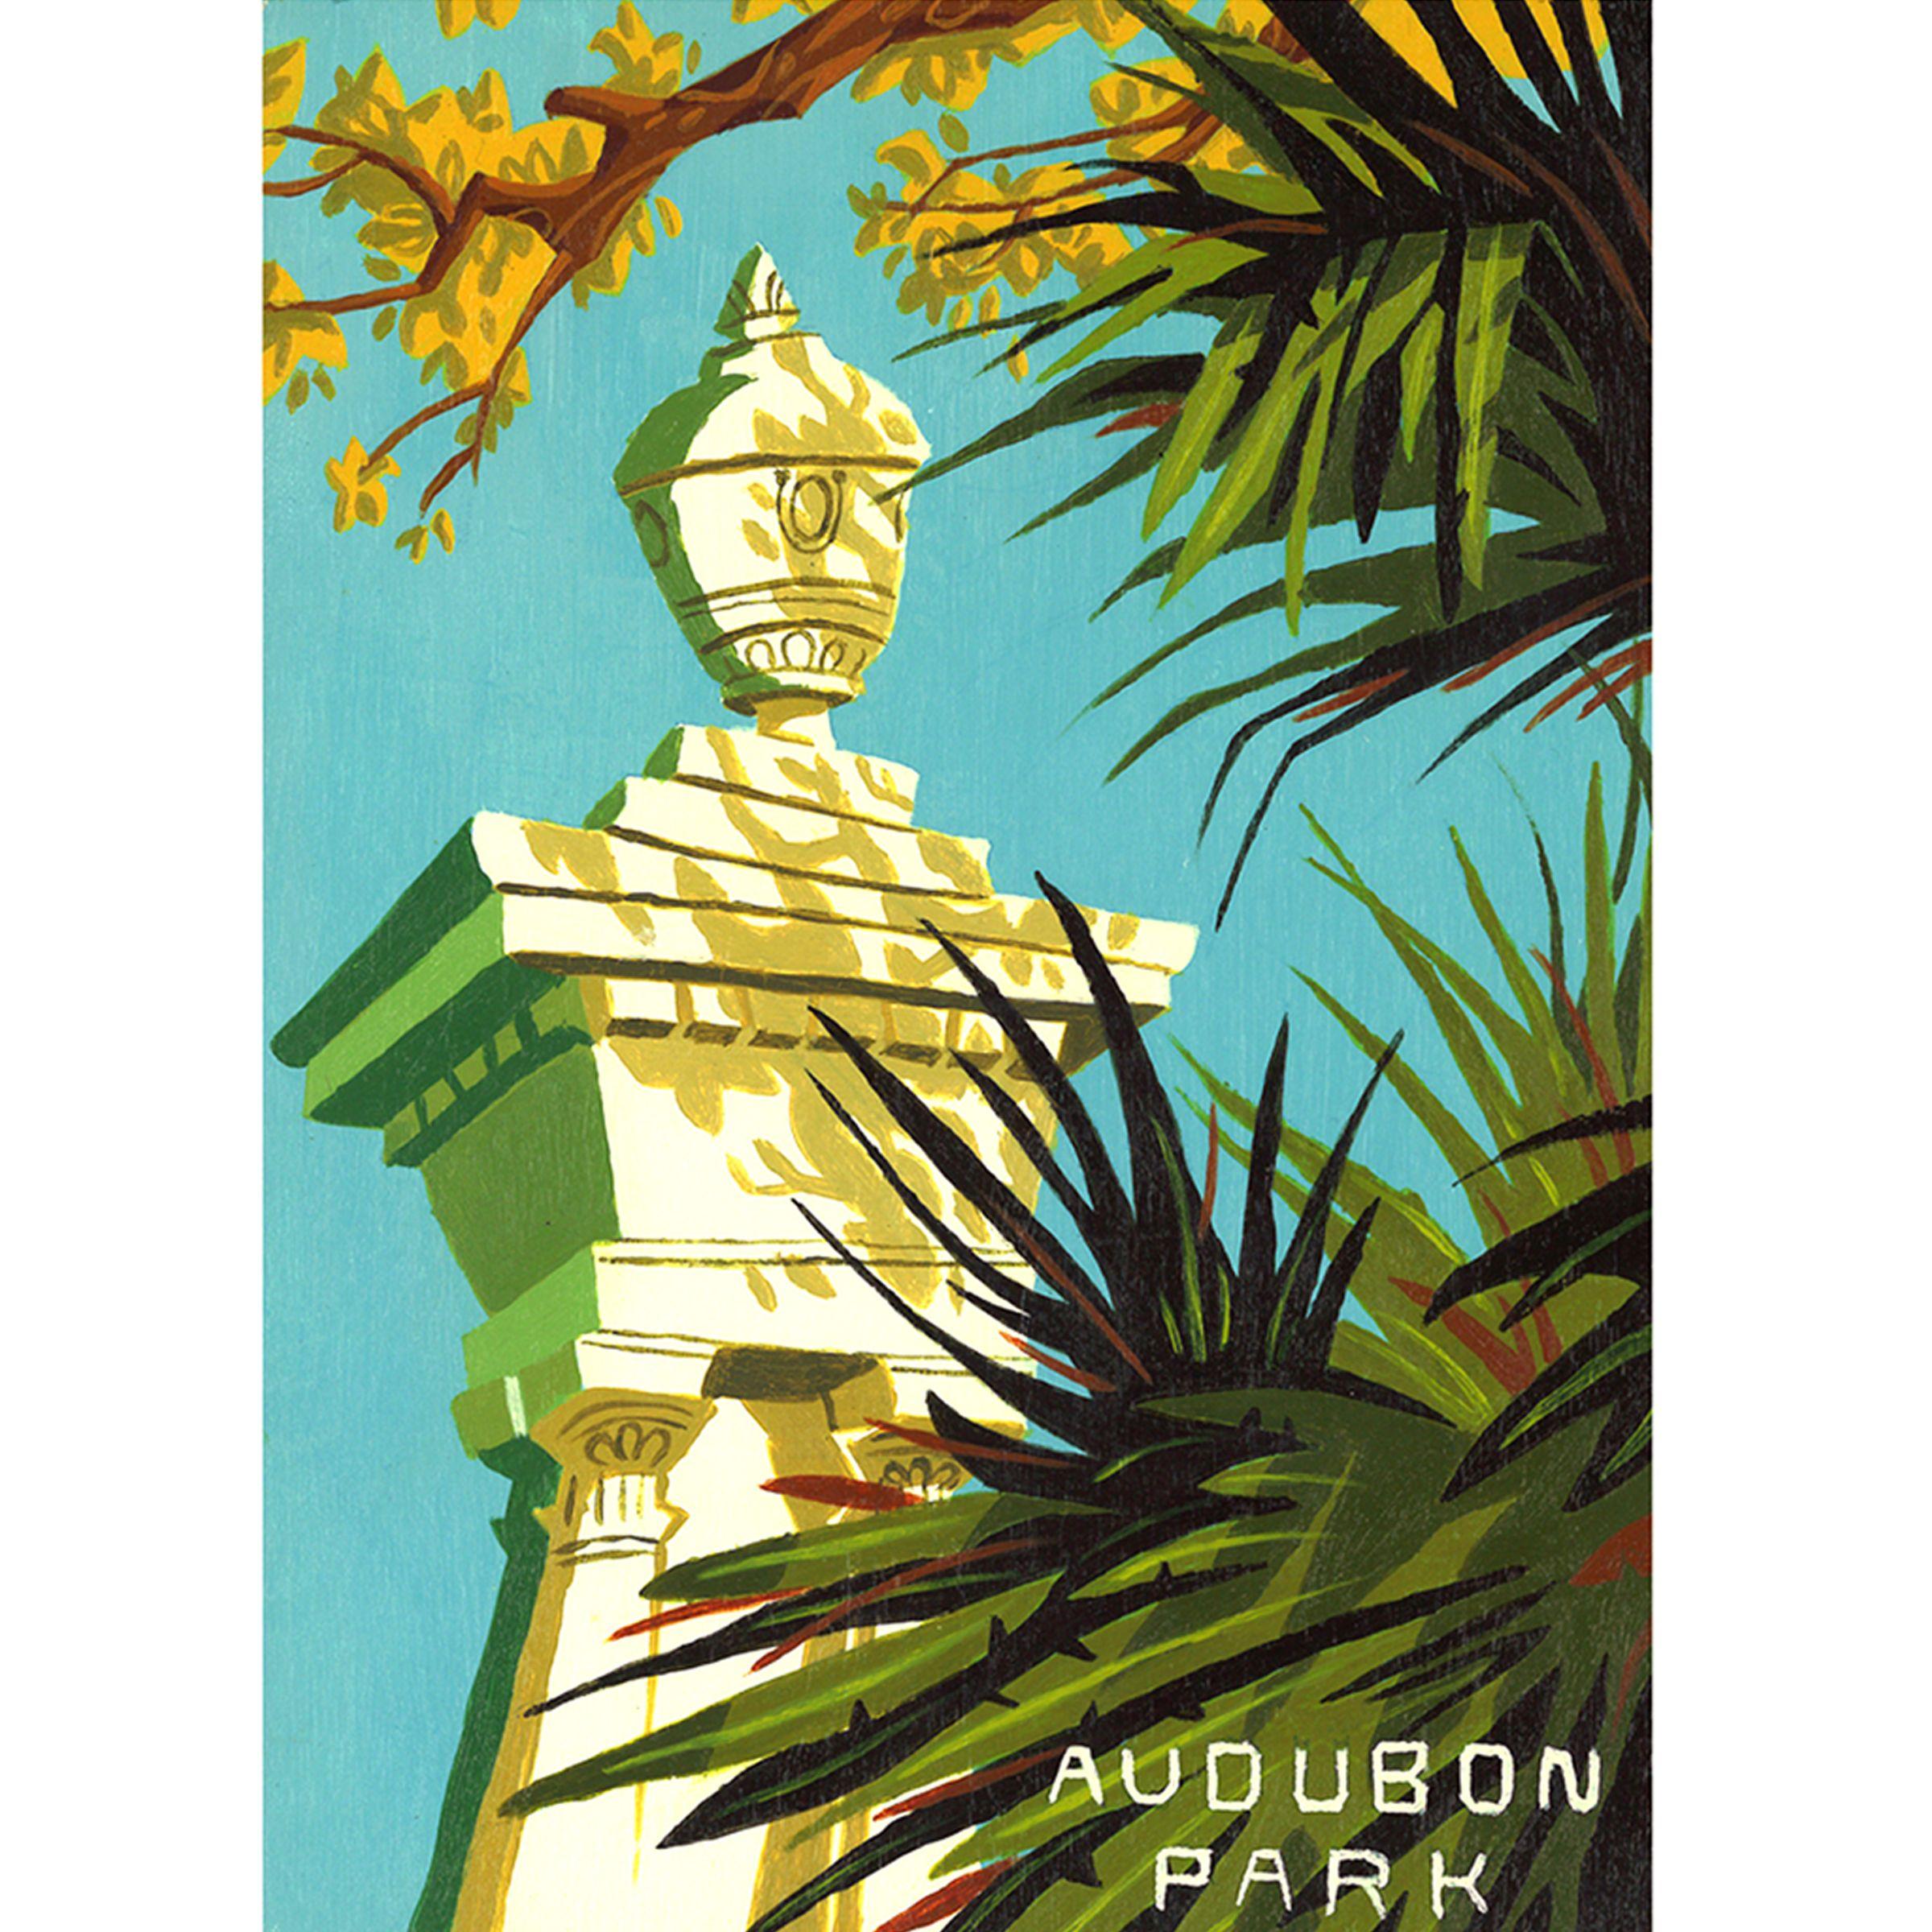 Audubon park john james audubon audubon park birds of